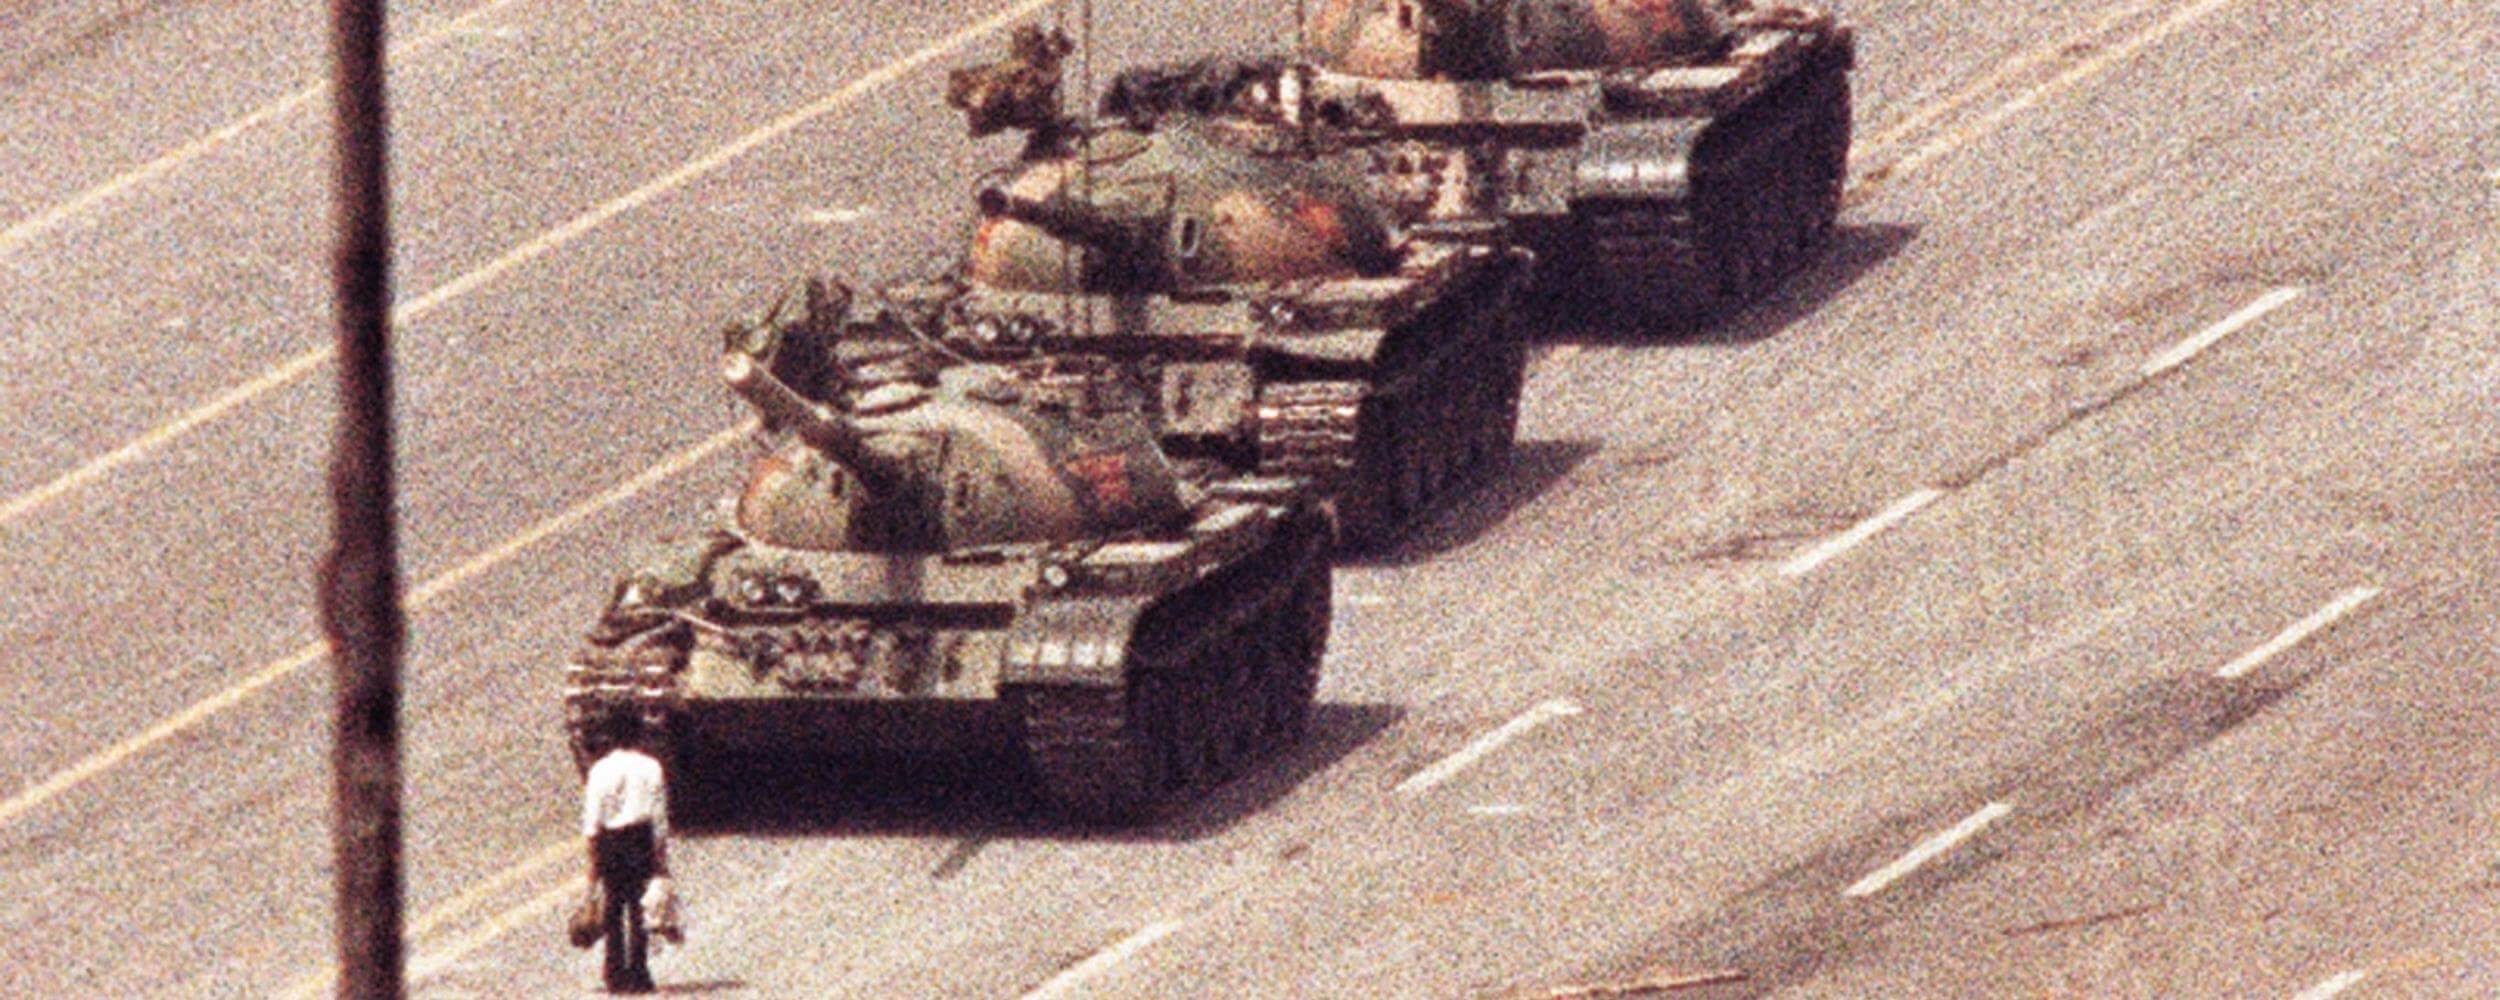 Tank Man Photo